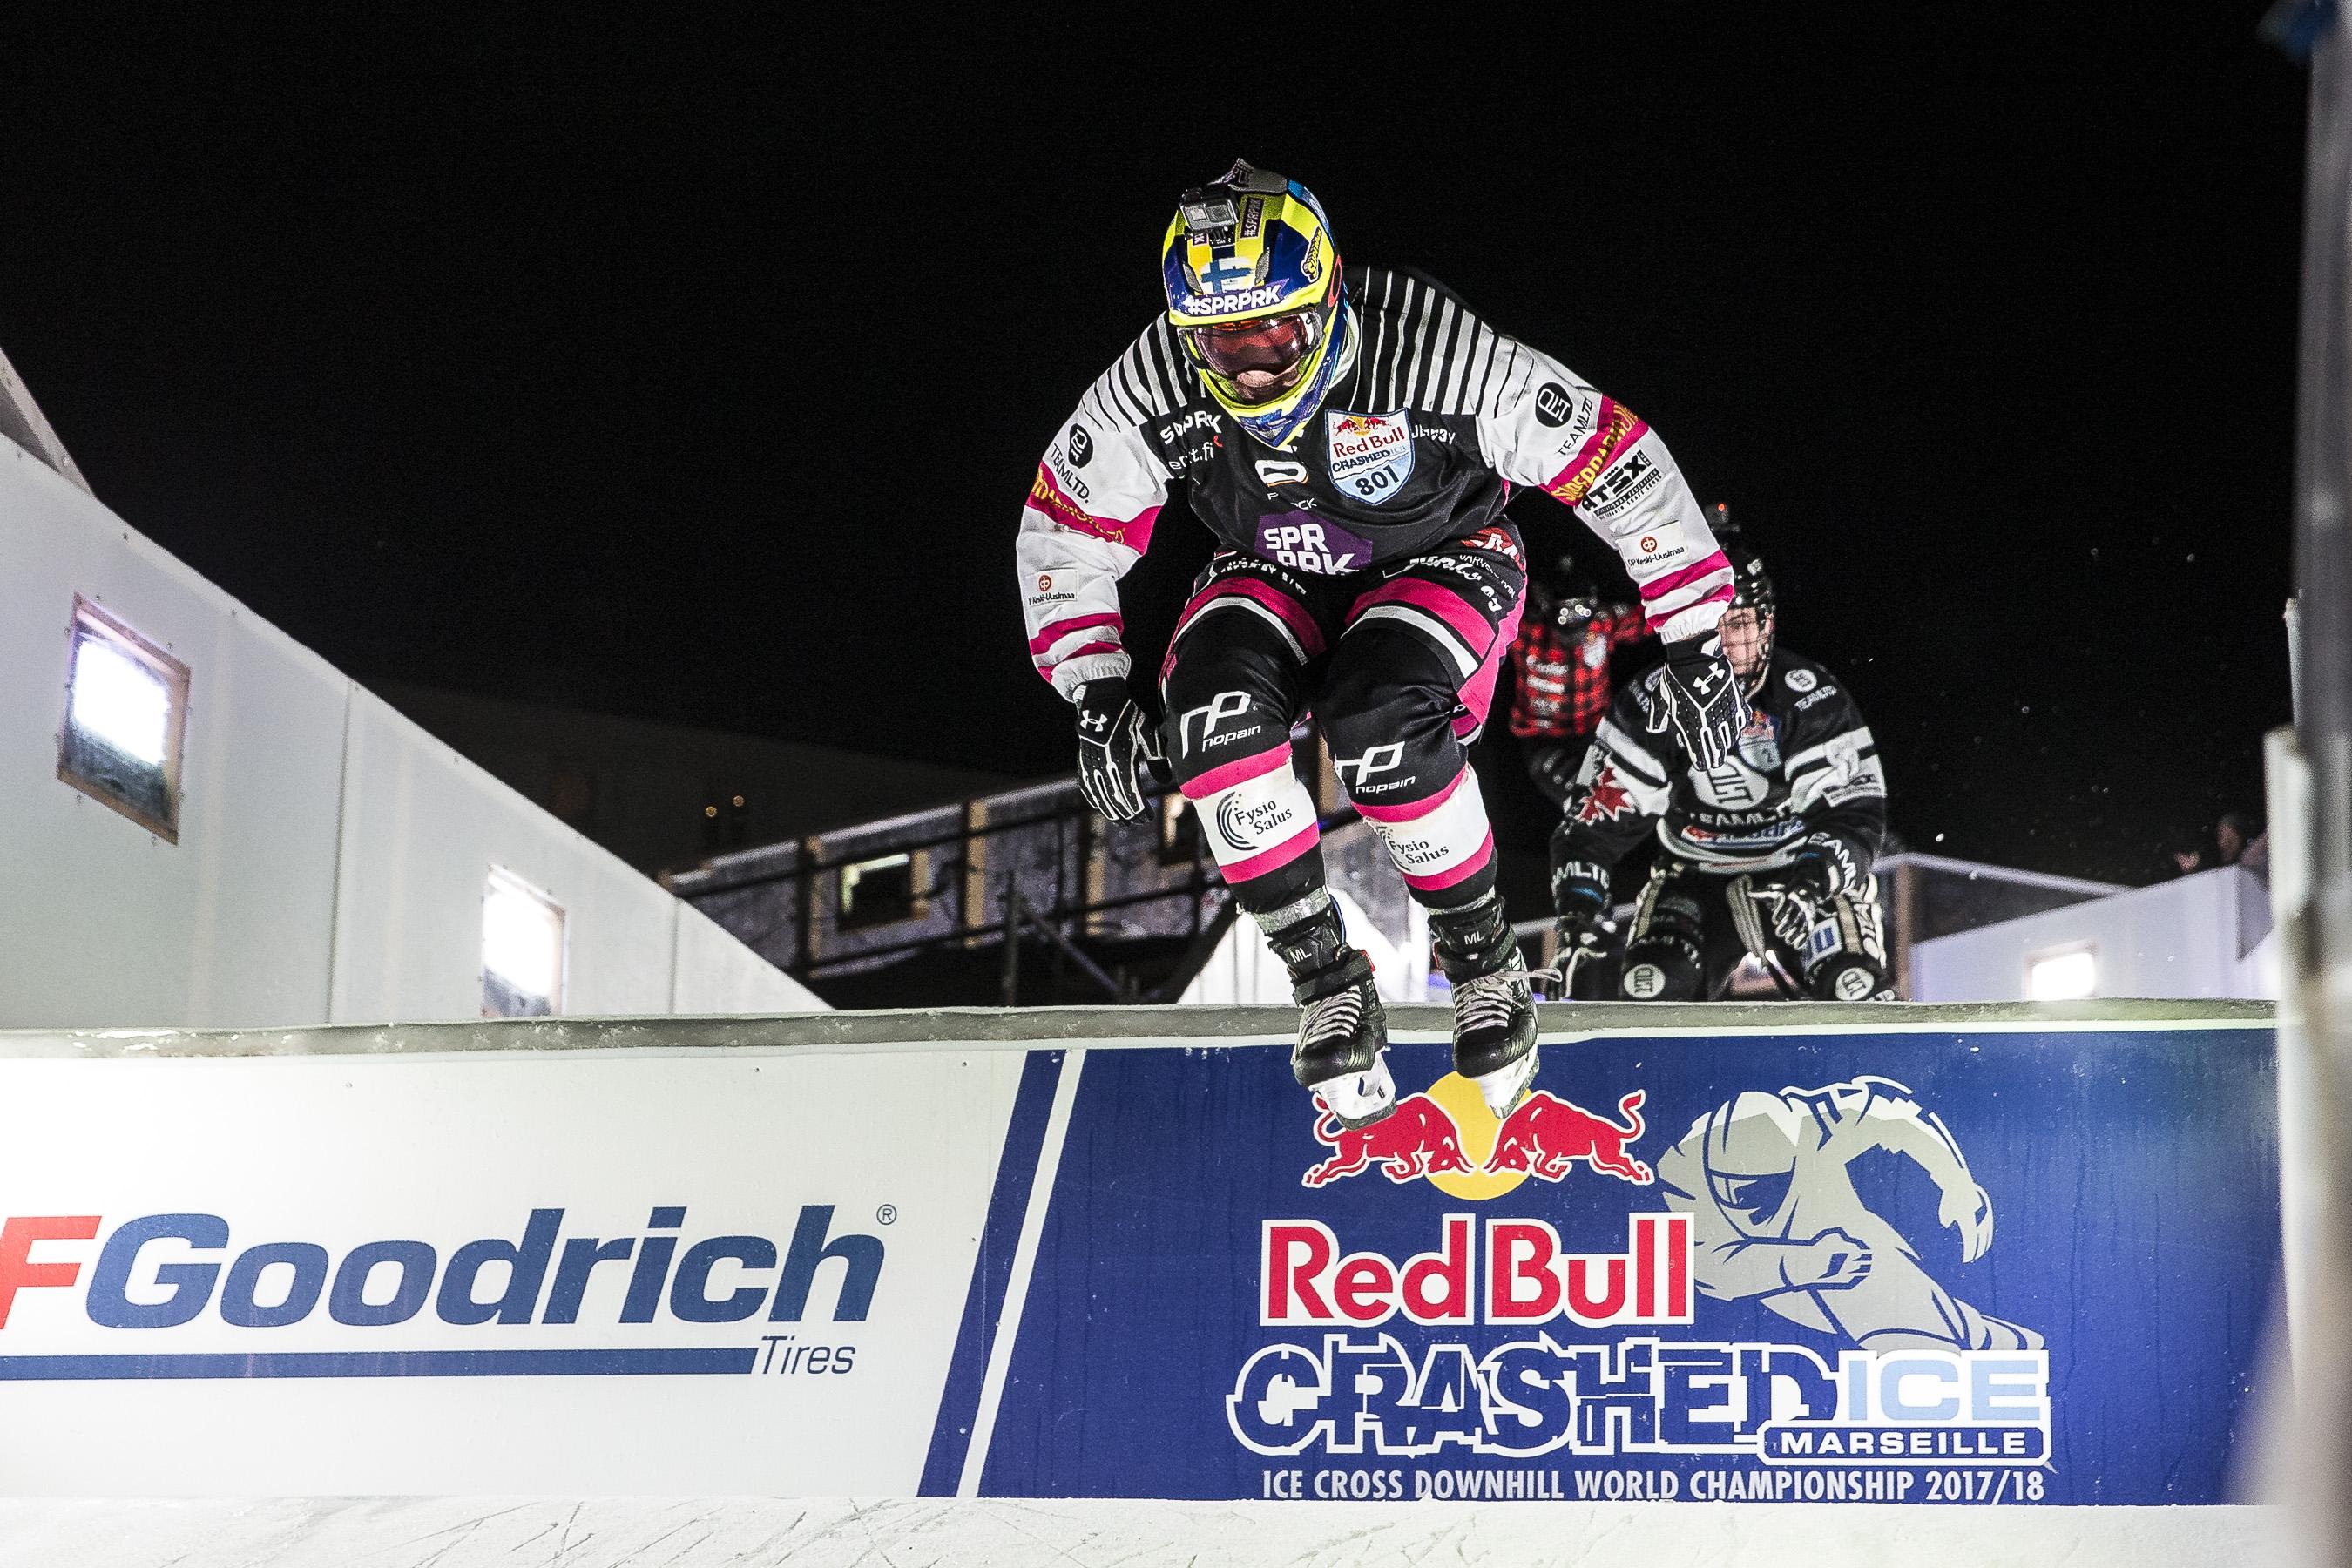 Portfolio(20180217 – Red Bull Crashed Ice Marseille – 1443)